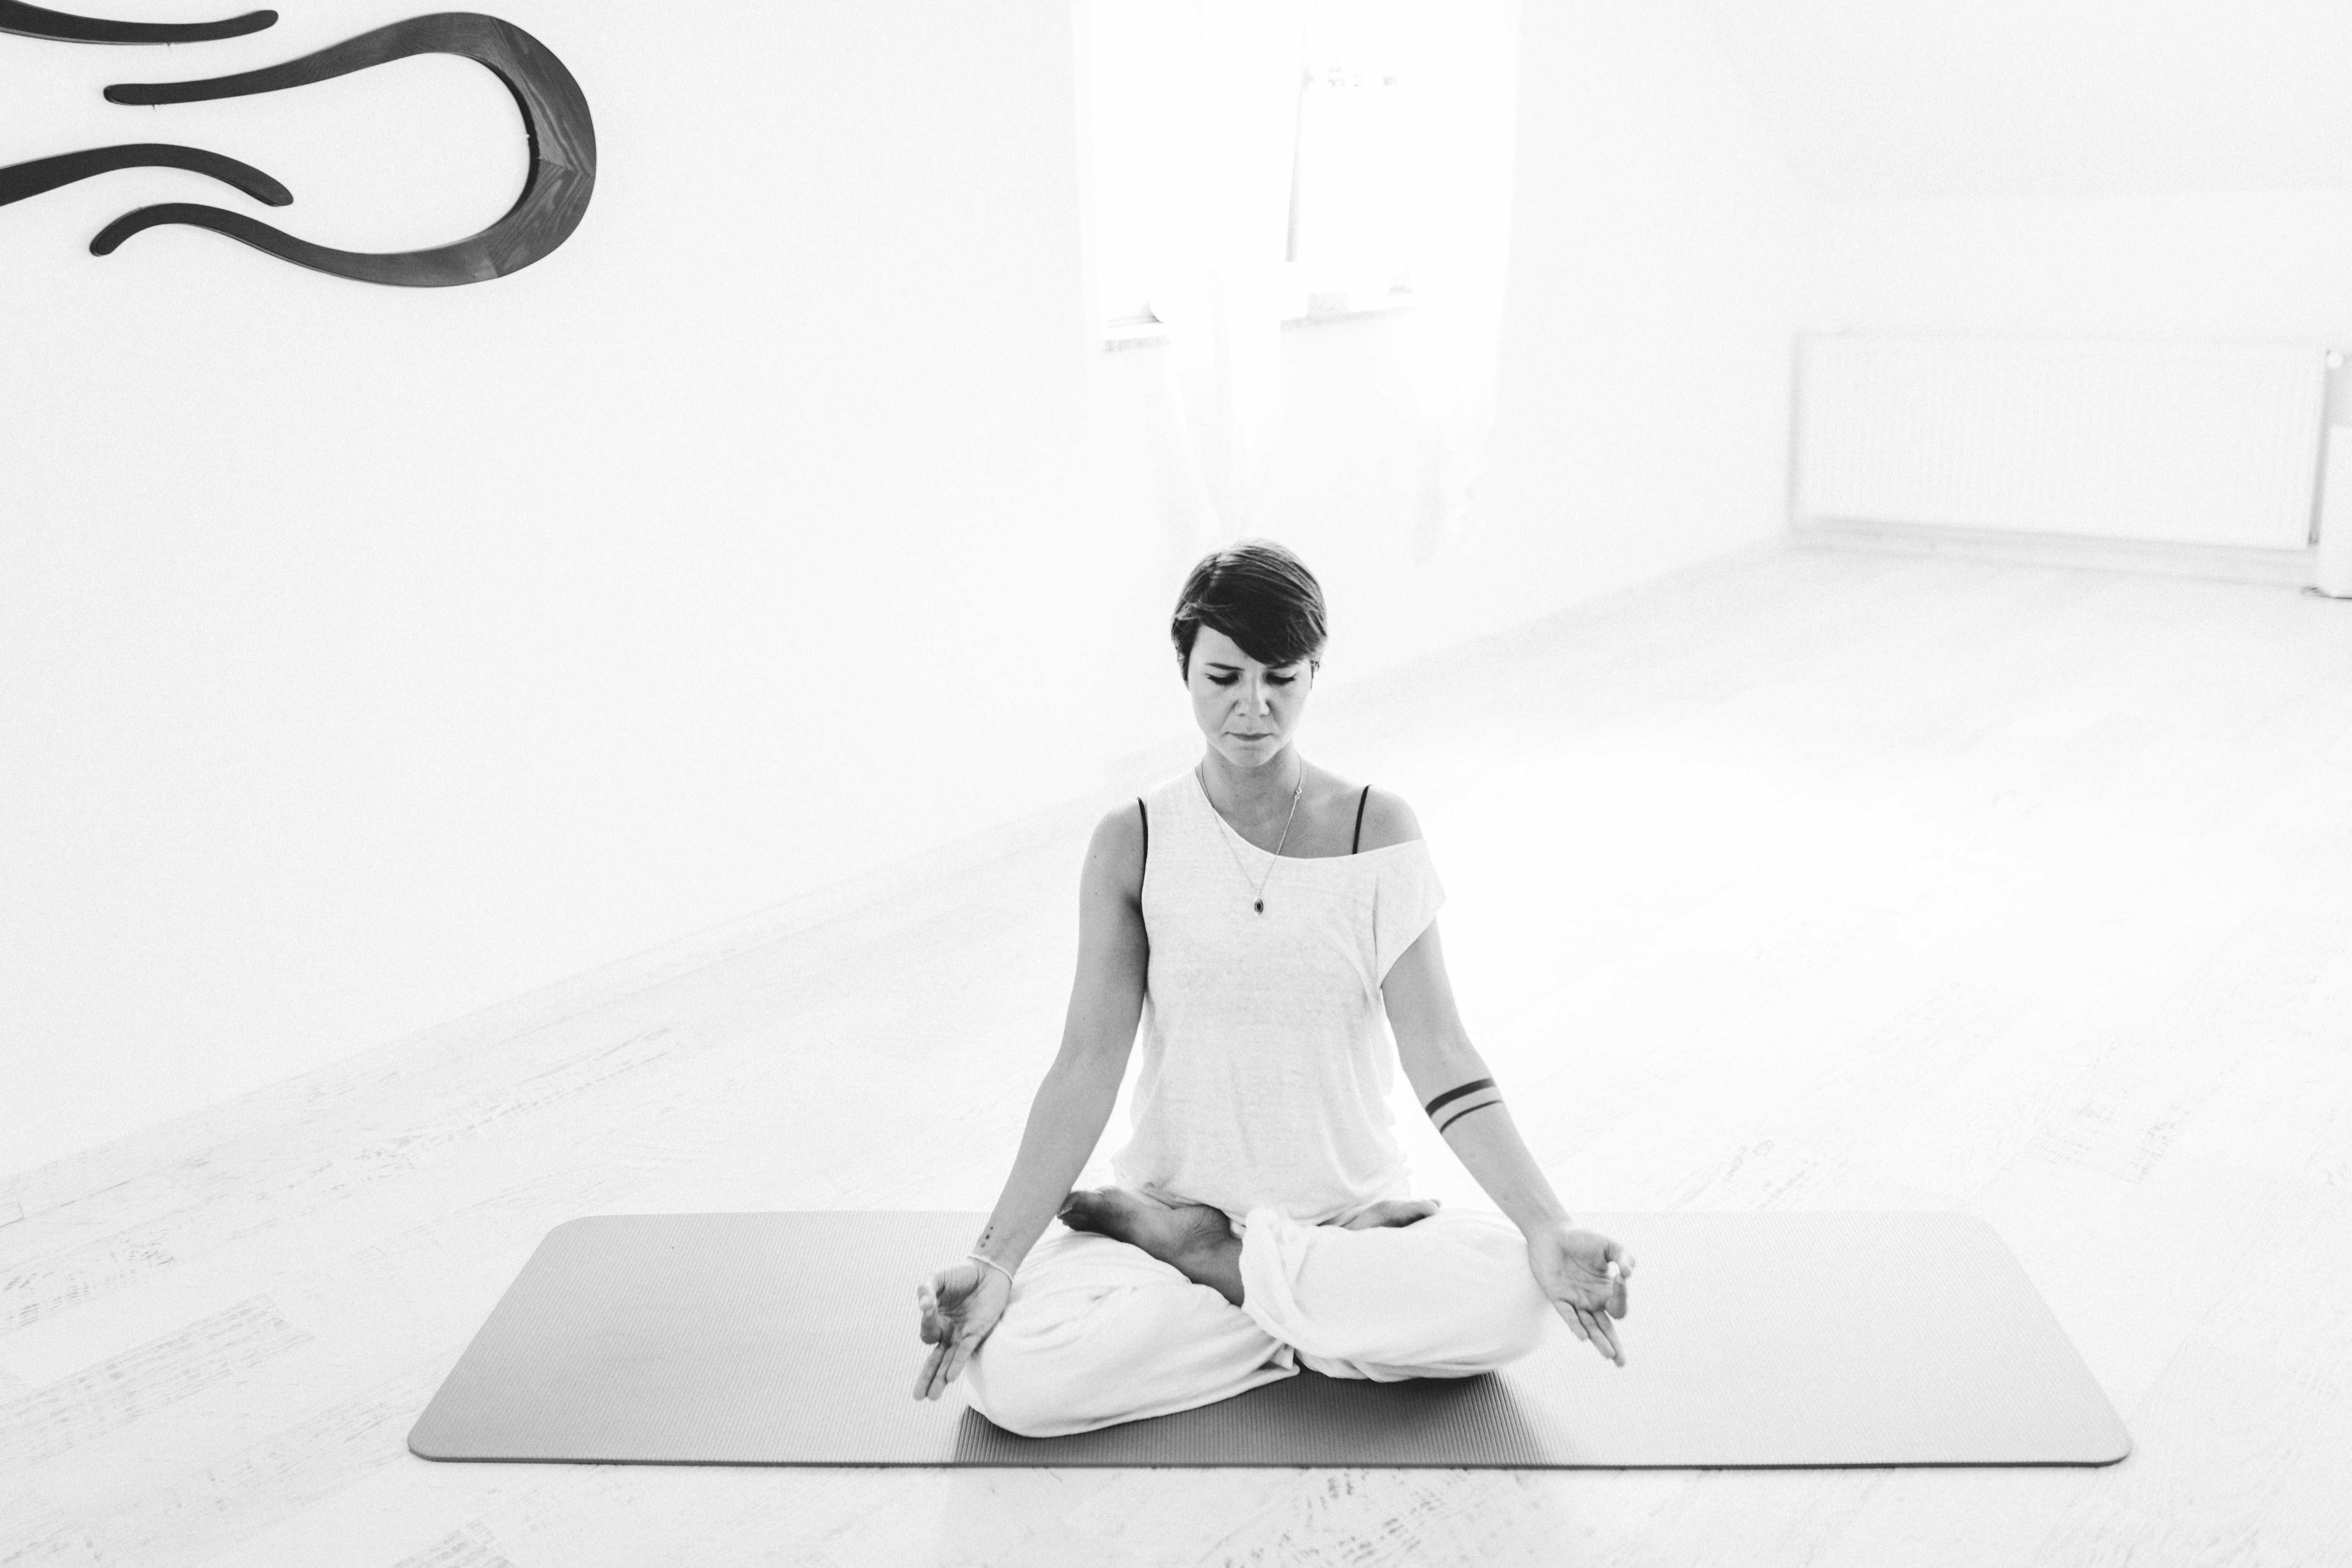 Meditative Ashtanga vinyasa masterclass